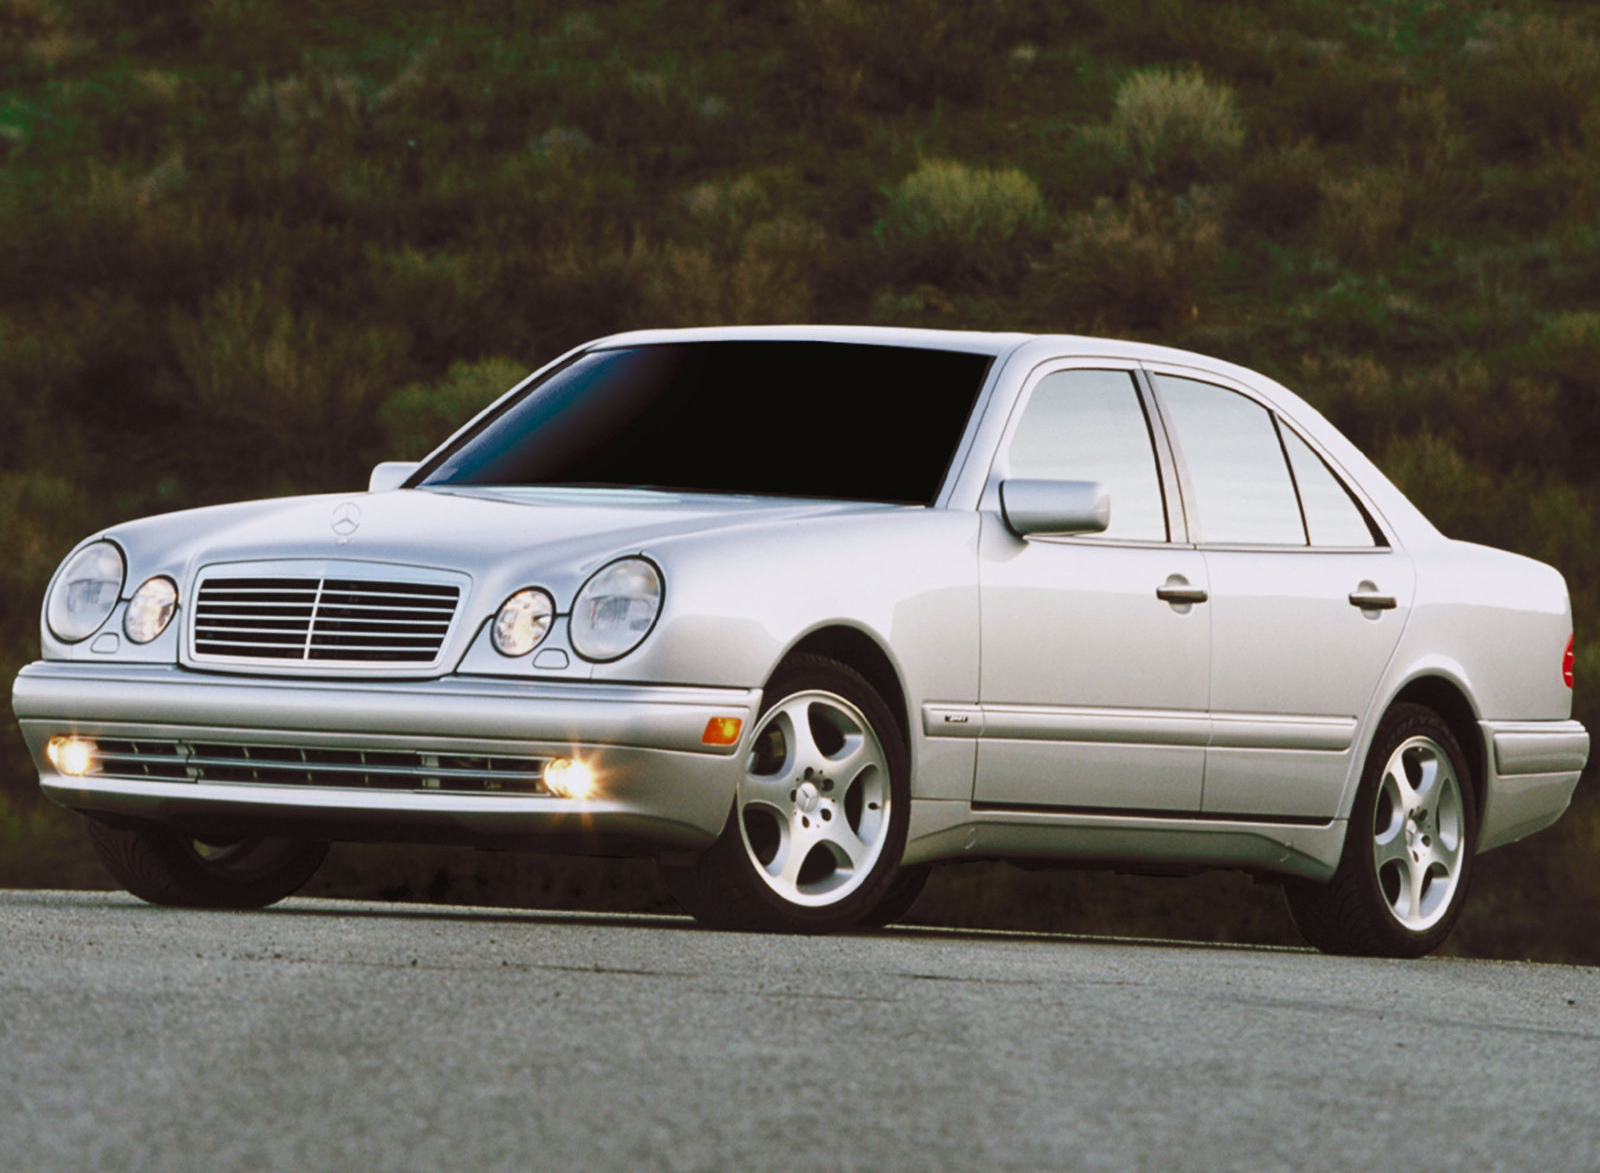 Mercedes-Benz (Мерседес-Бенц) E-class W210 1999-2002 г.